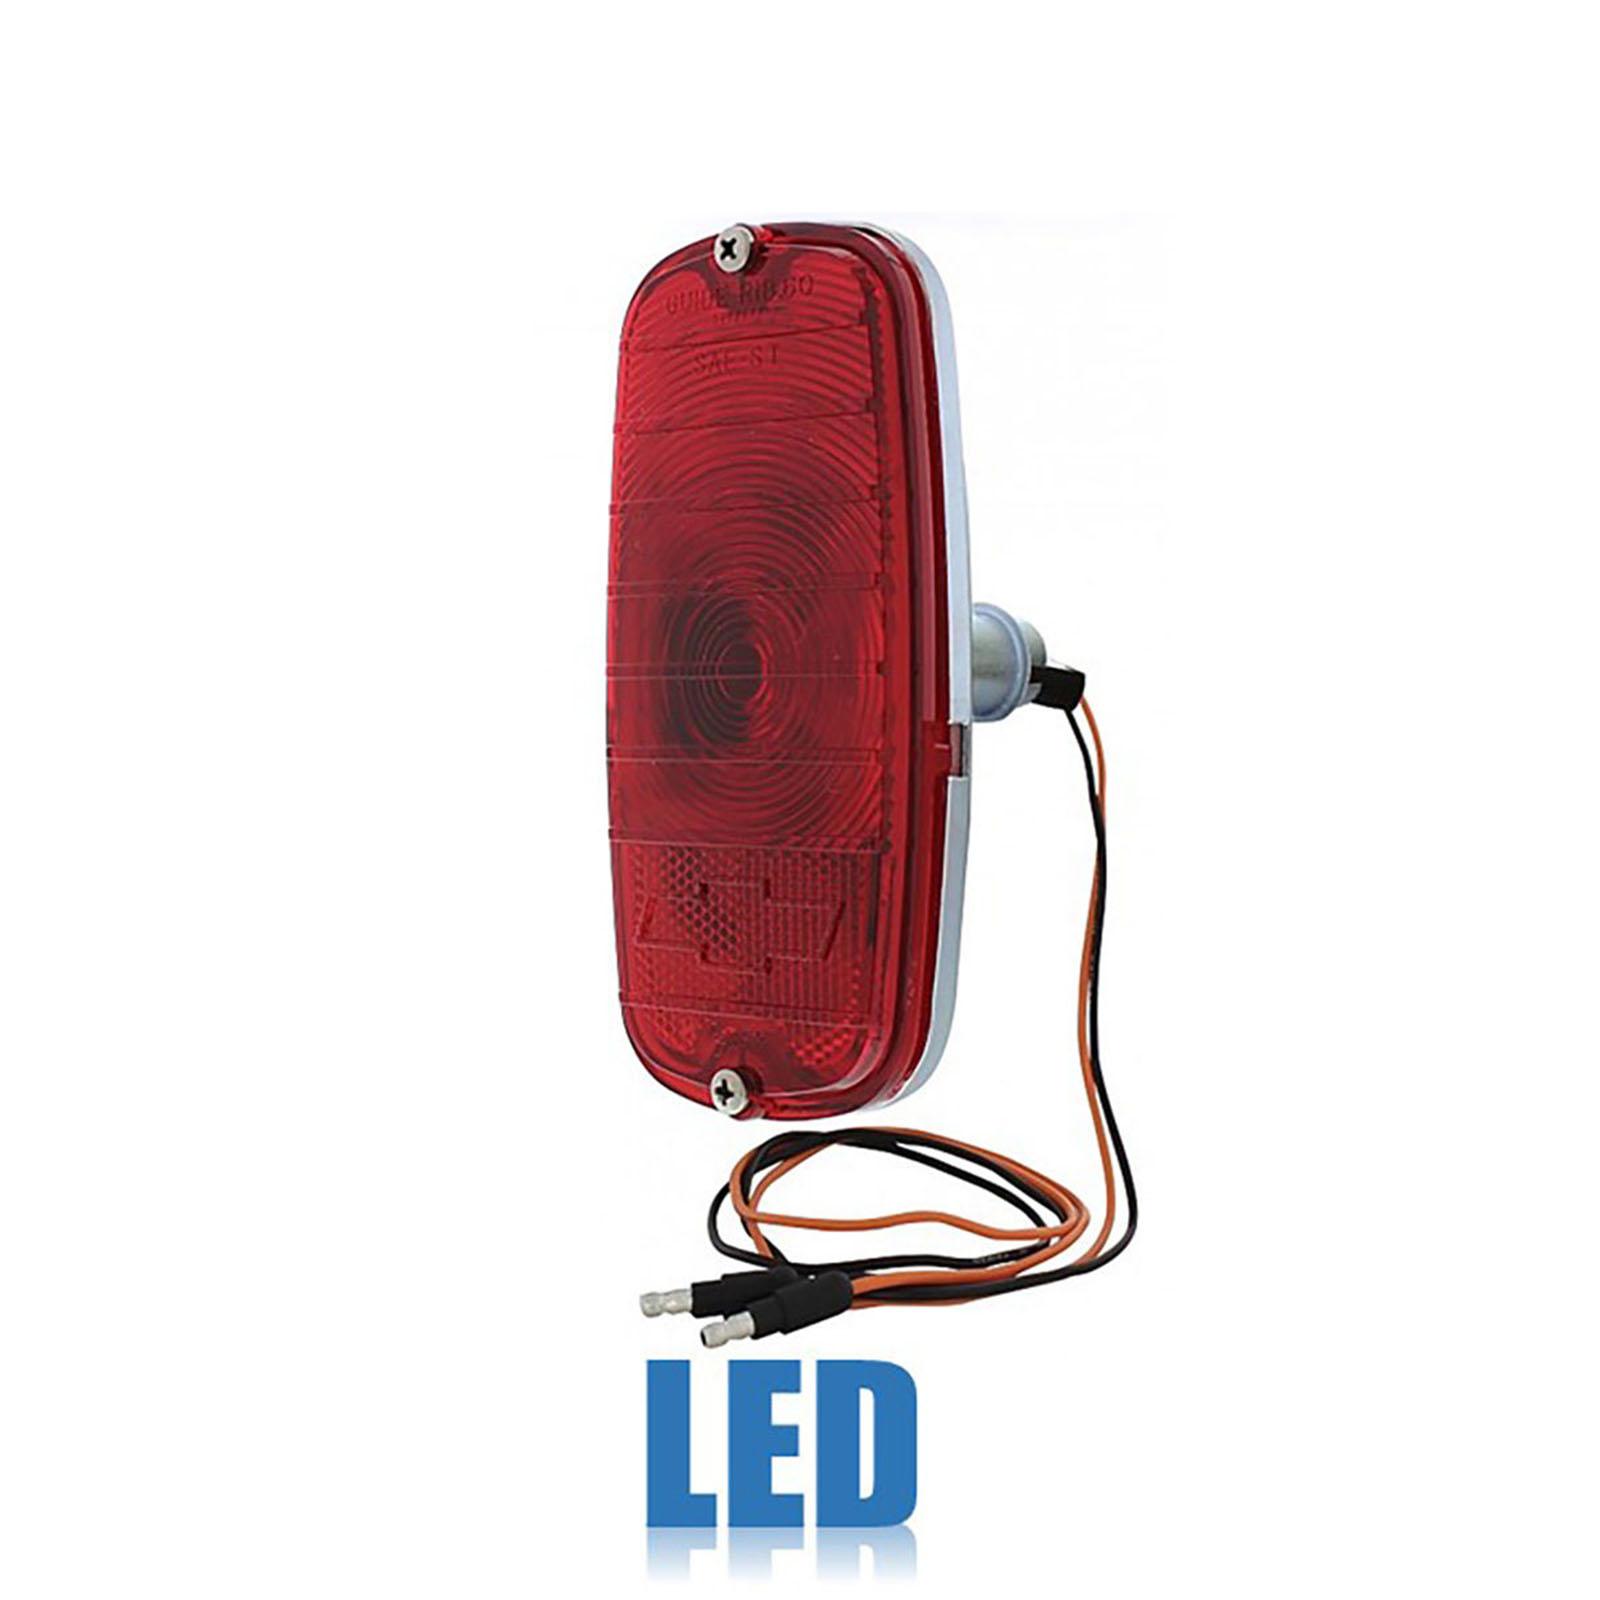 60 61 62 63 64 65 66 Chevy Fleetside Gmc Truck Tail Light Lamp Lens Assembly